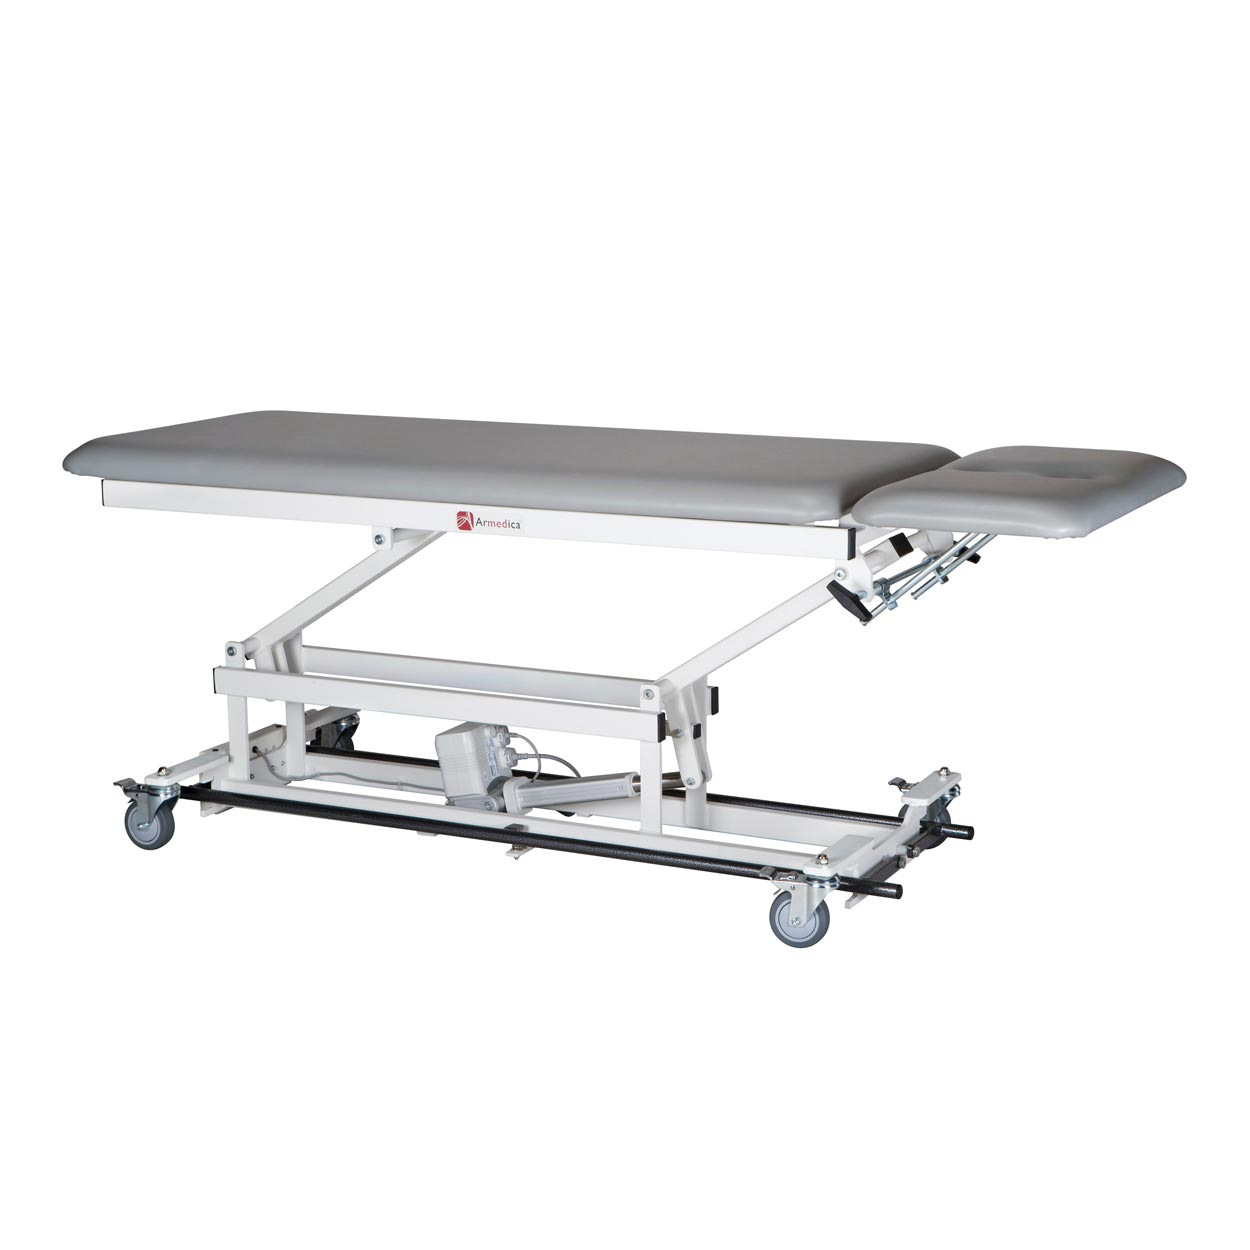 Armedica AM-BA 200 treatment table